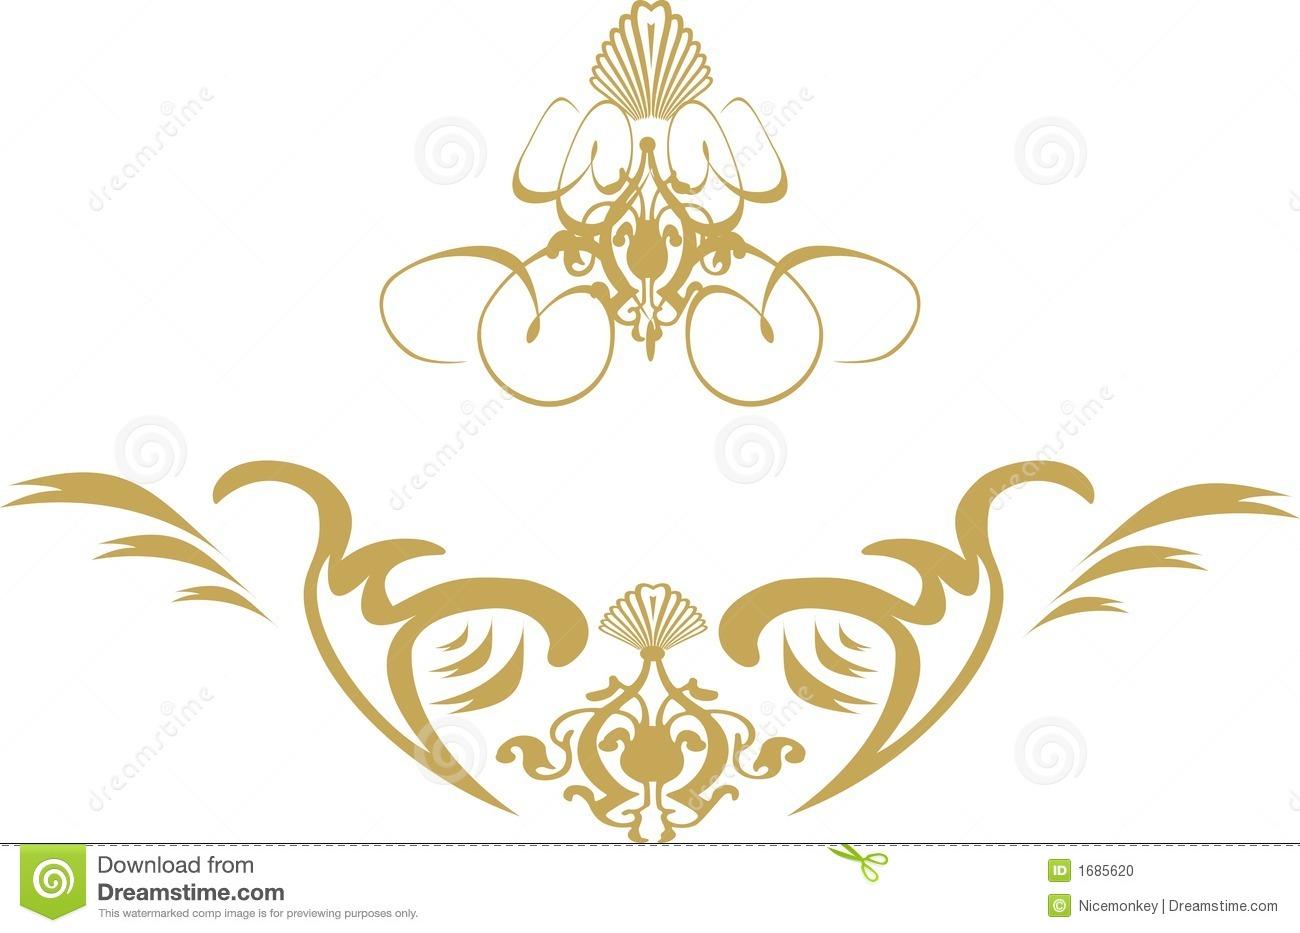 14 Gold Swirl Design Images - Free Gold Vector Swirl ...